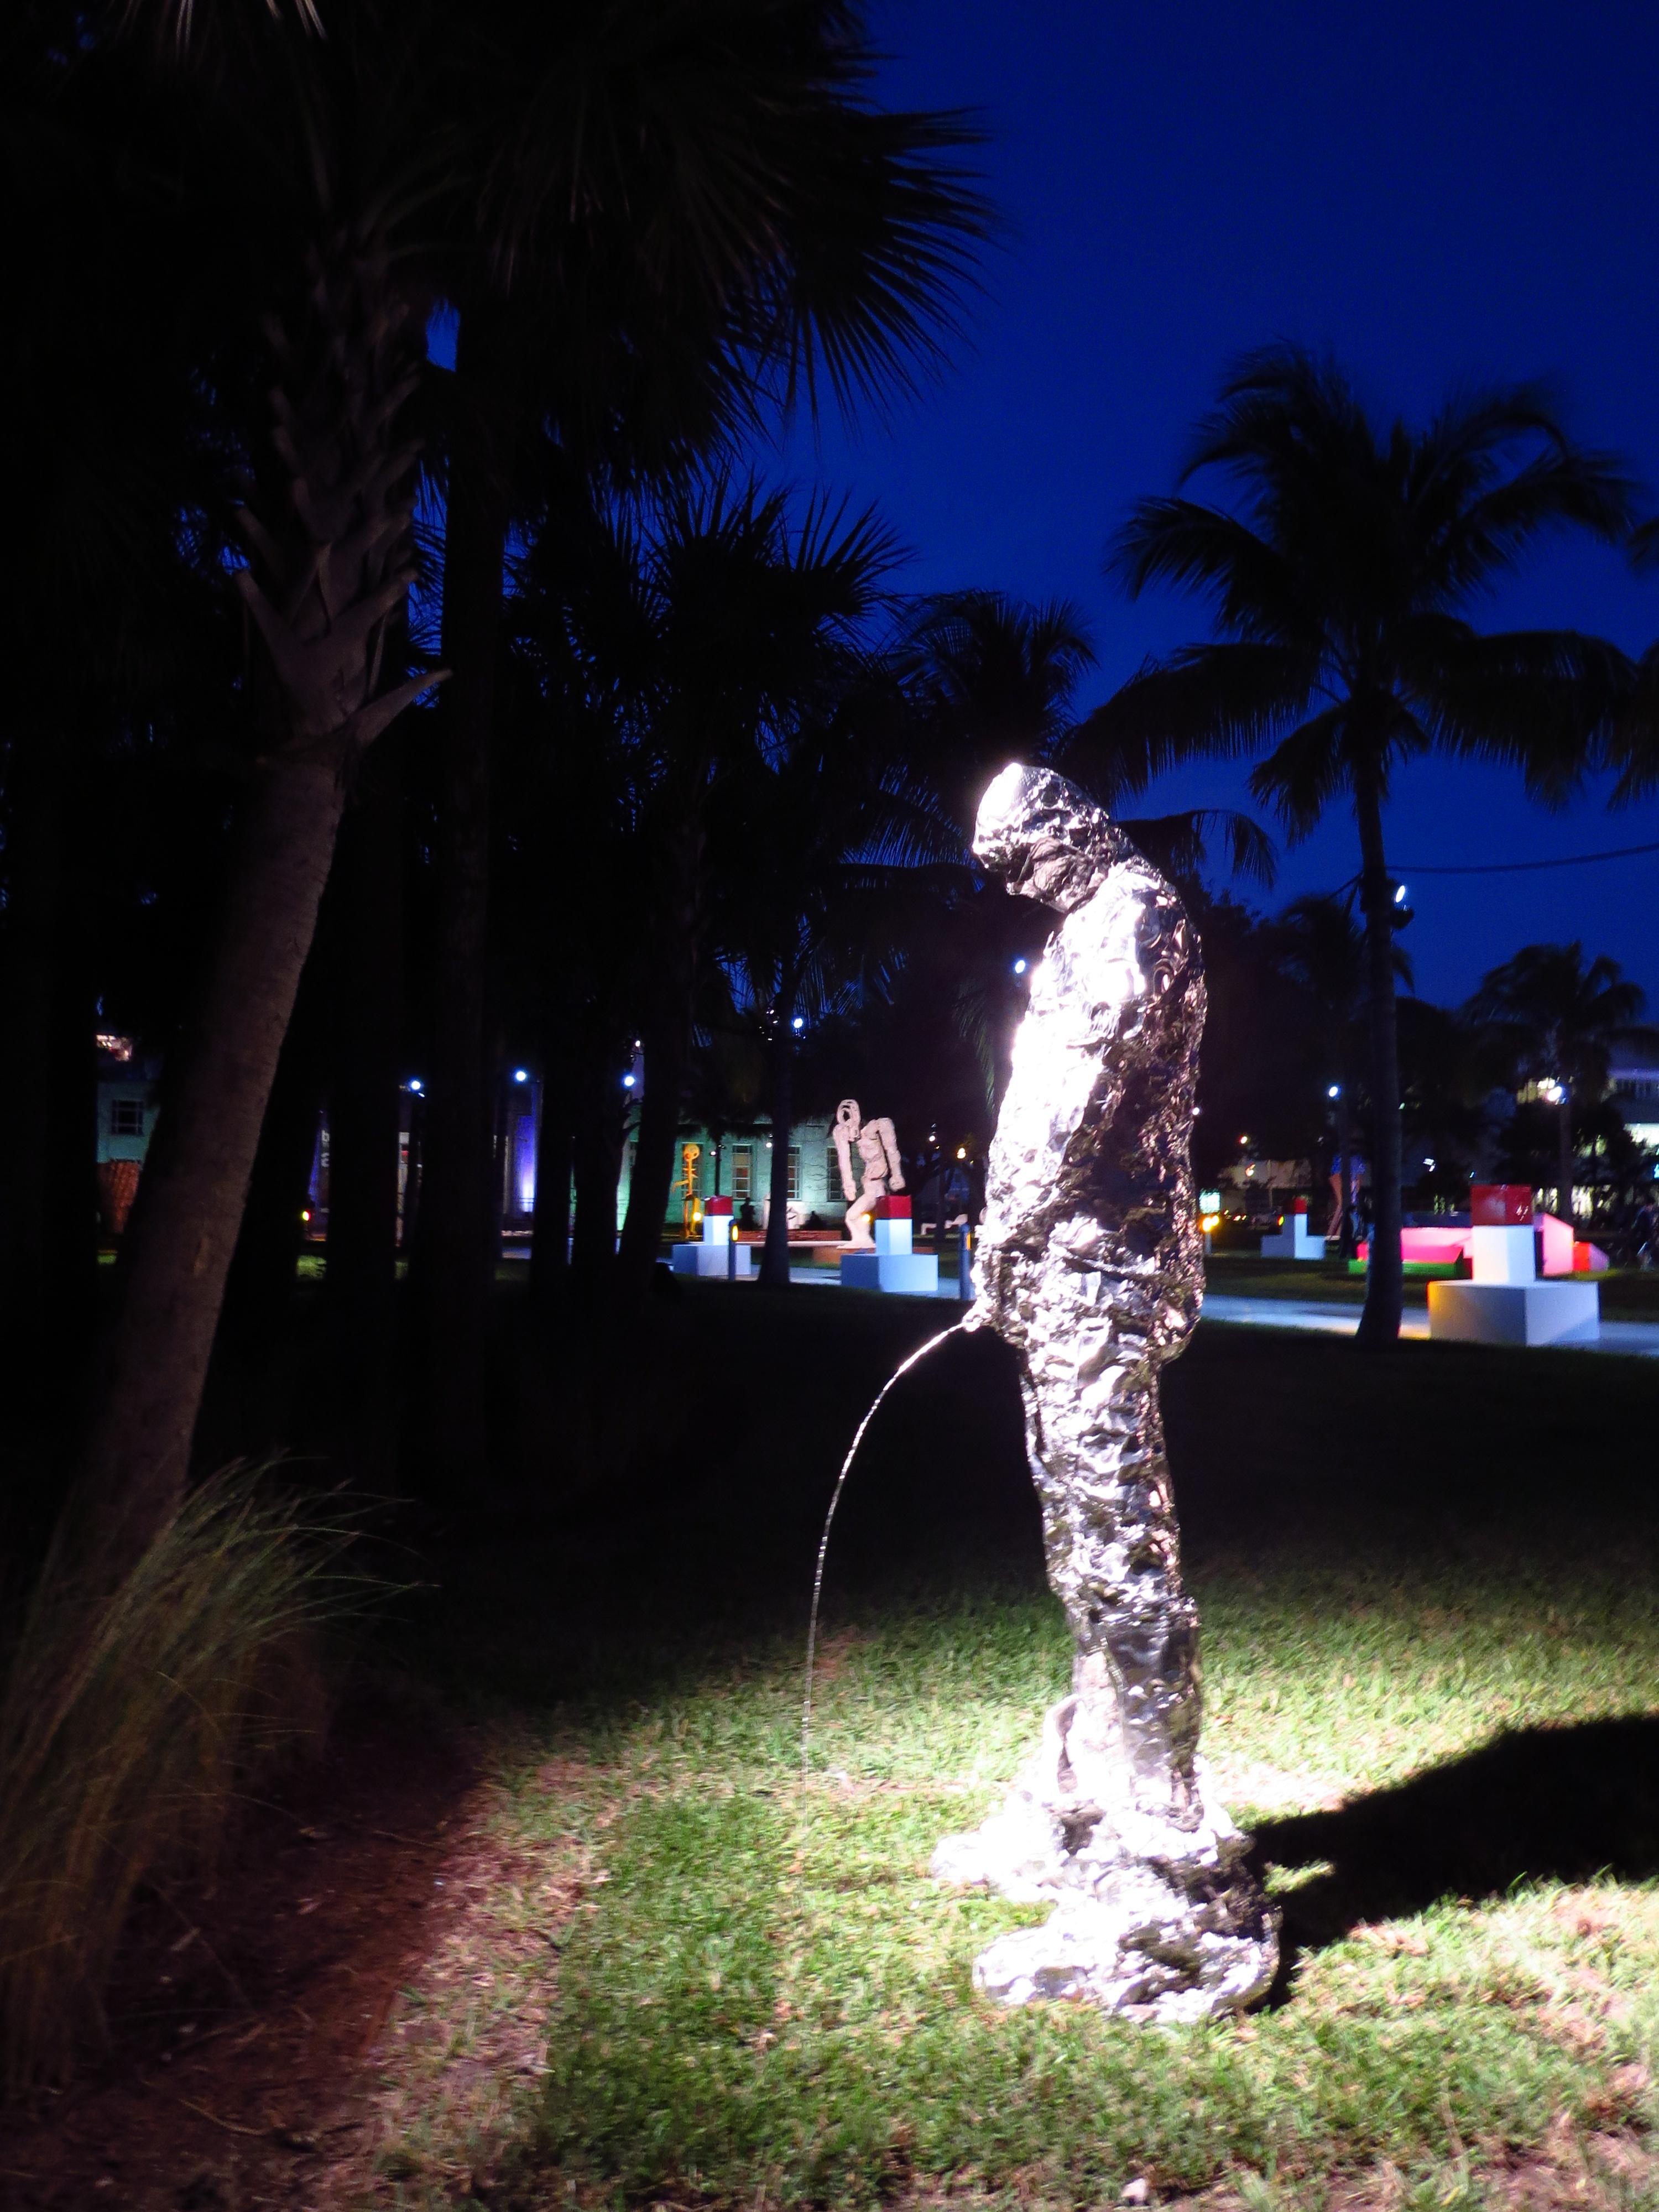 MIAMI STREET ART NIGHTTIME IS THE RIGHT TIME TOKIDOKI NOMAD